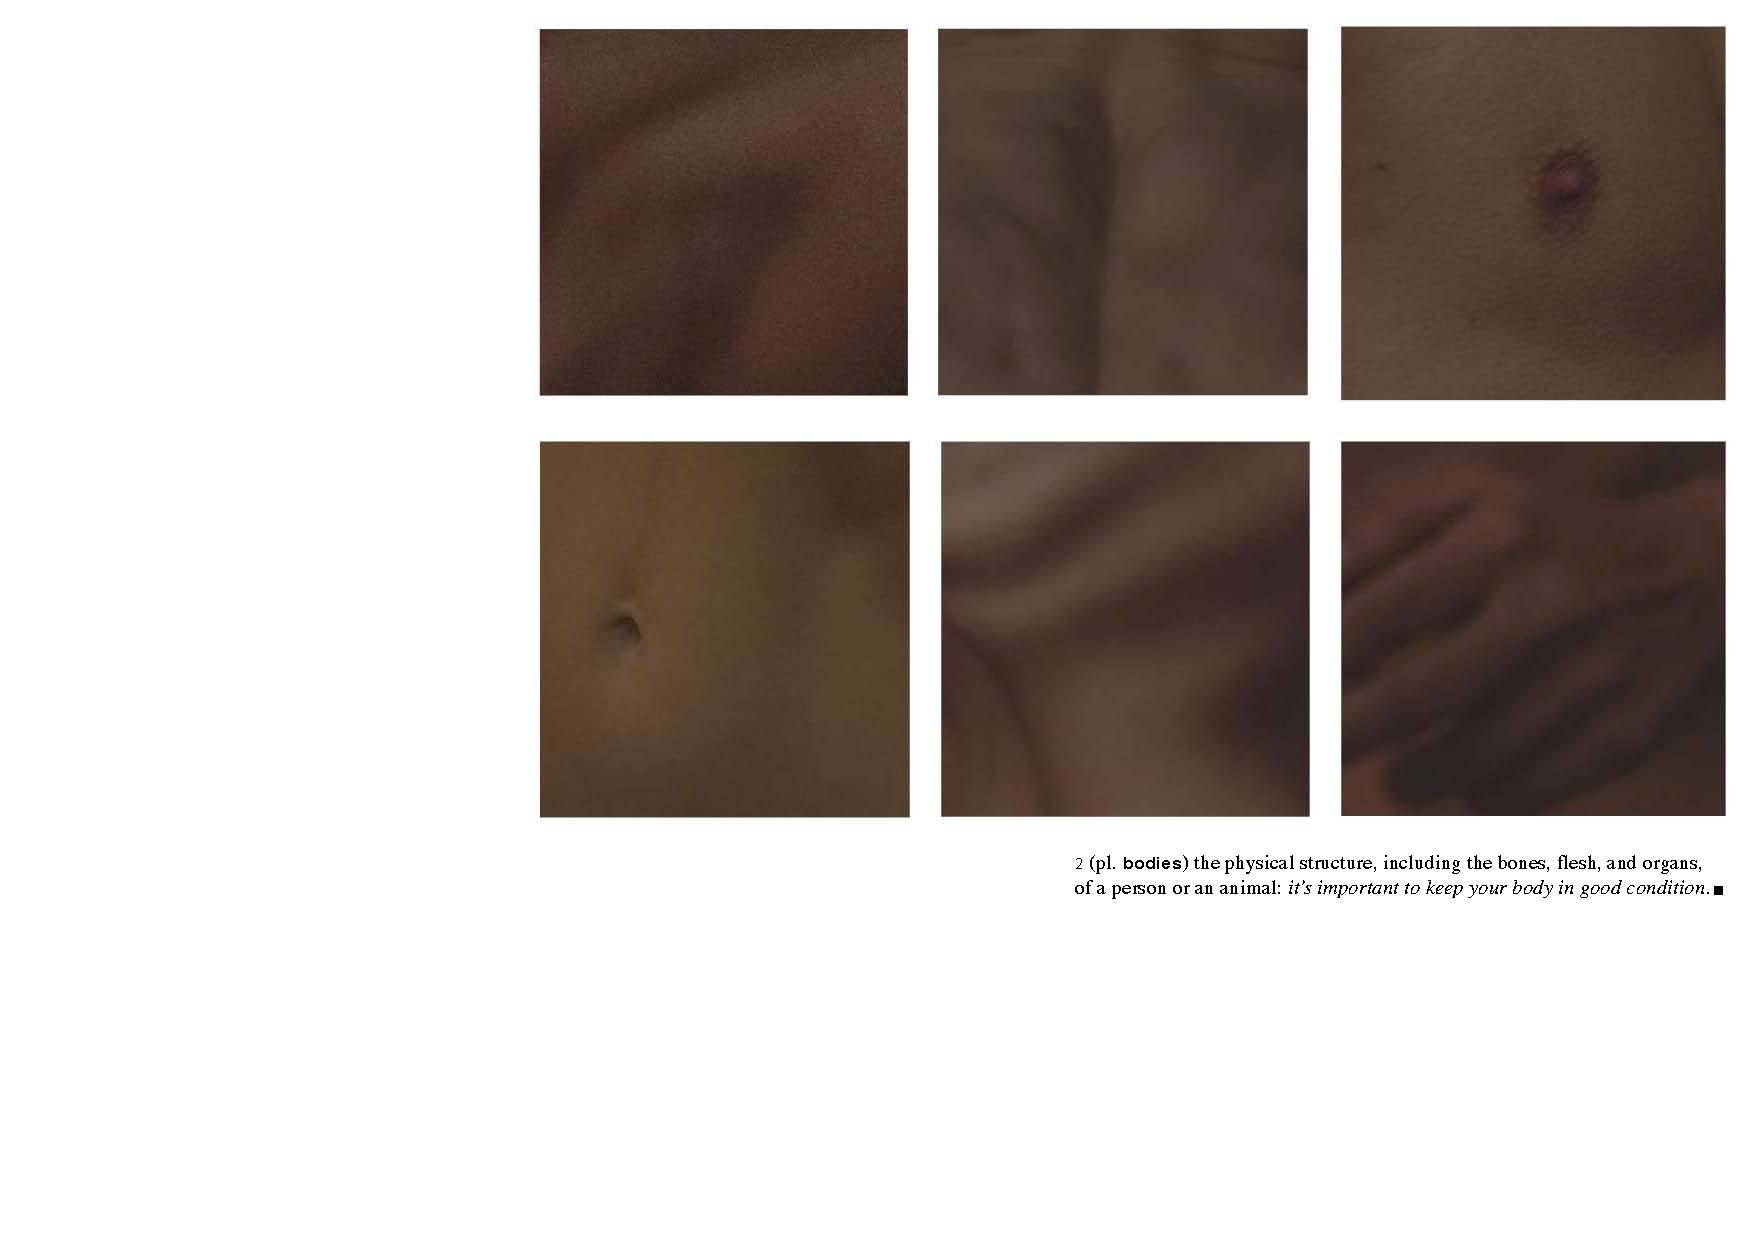 body-semantics_Pagina_3.jpg